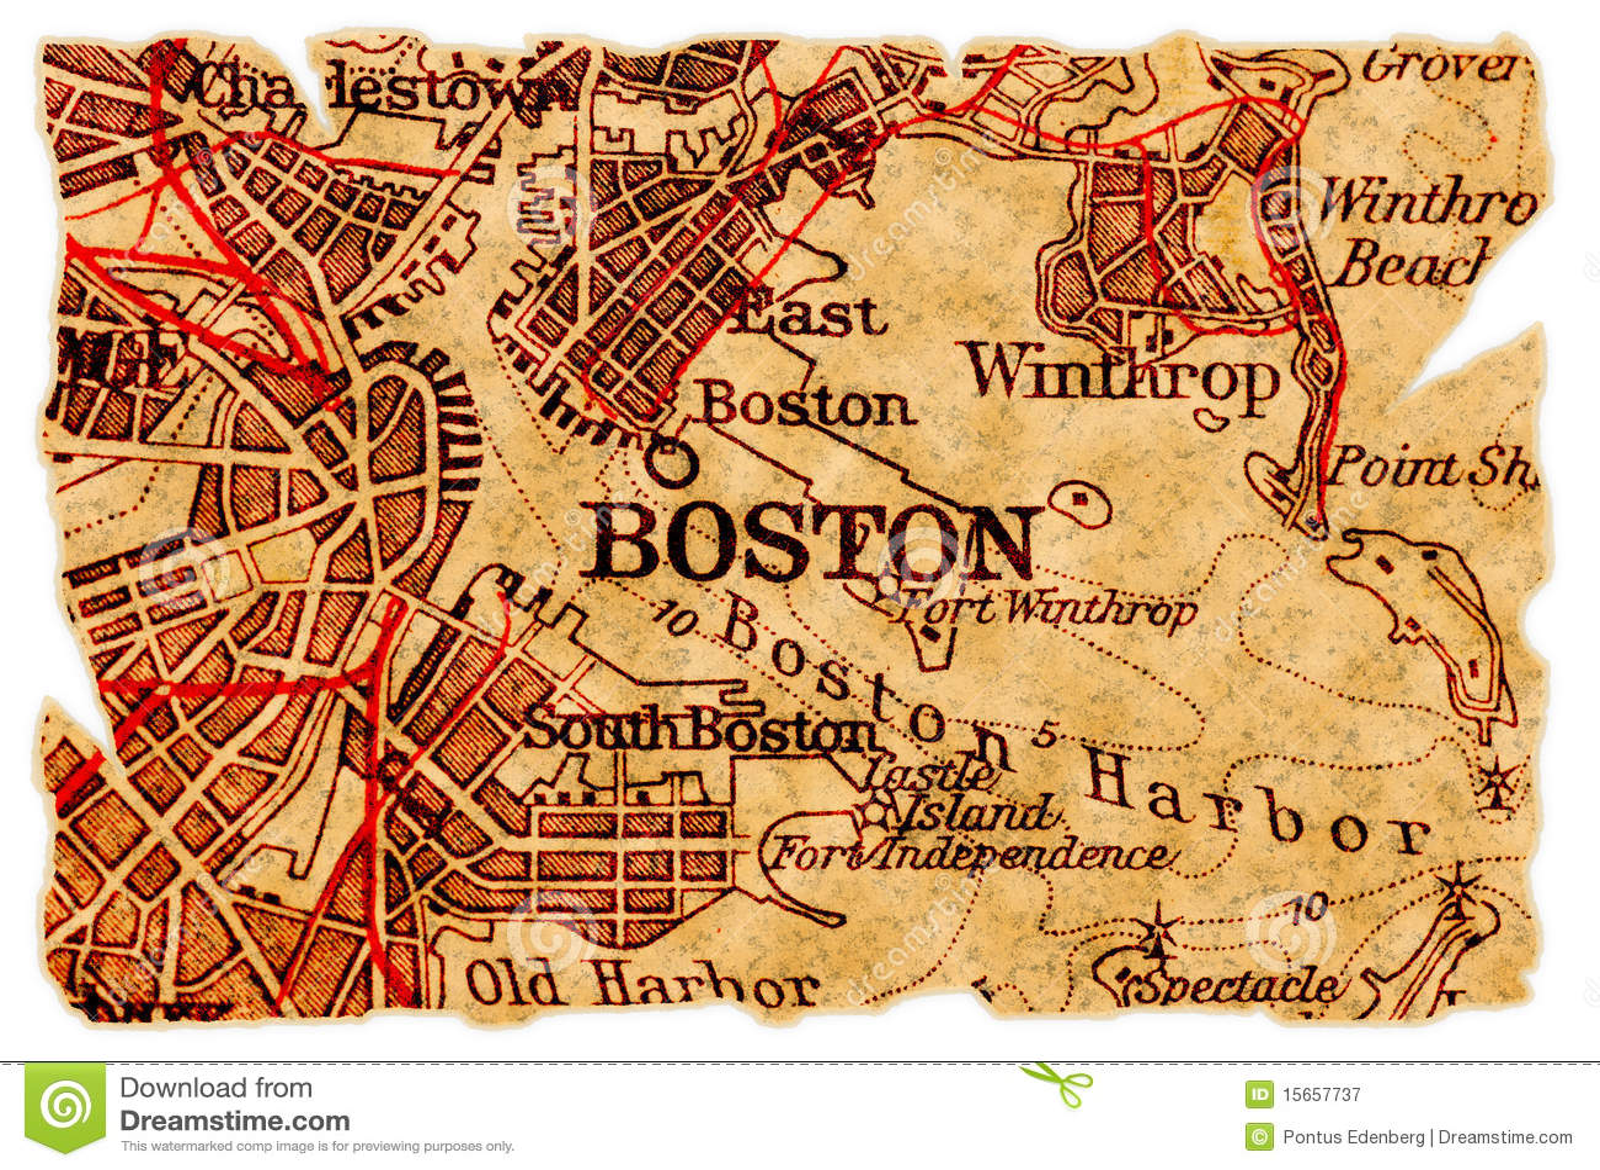 Old paris street map royalty free stock photo image 15885665 - Boston Old Map Royalty Free Stock Photography